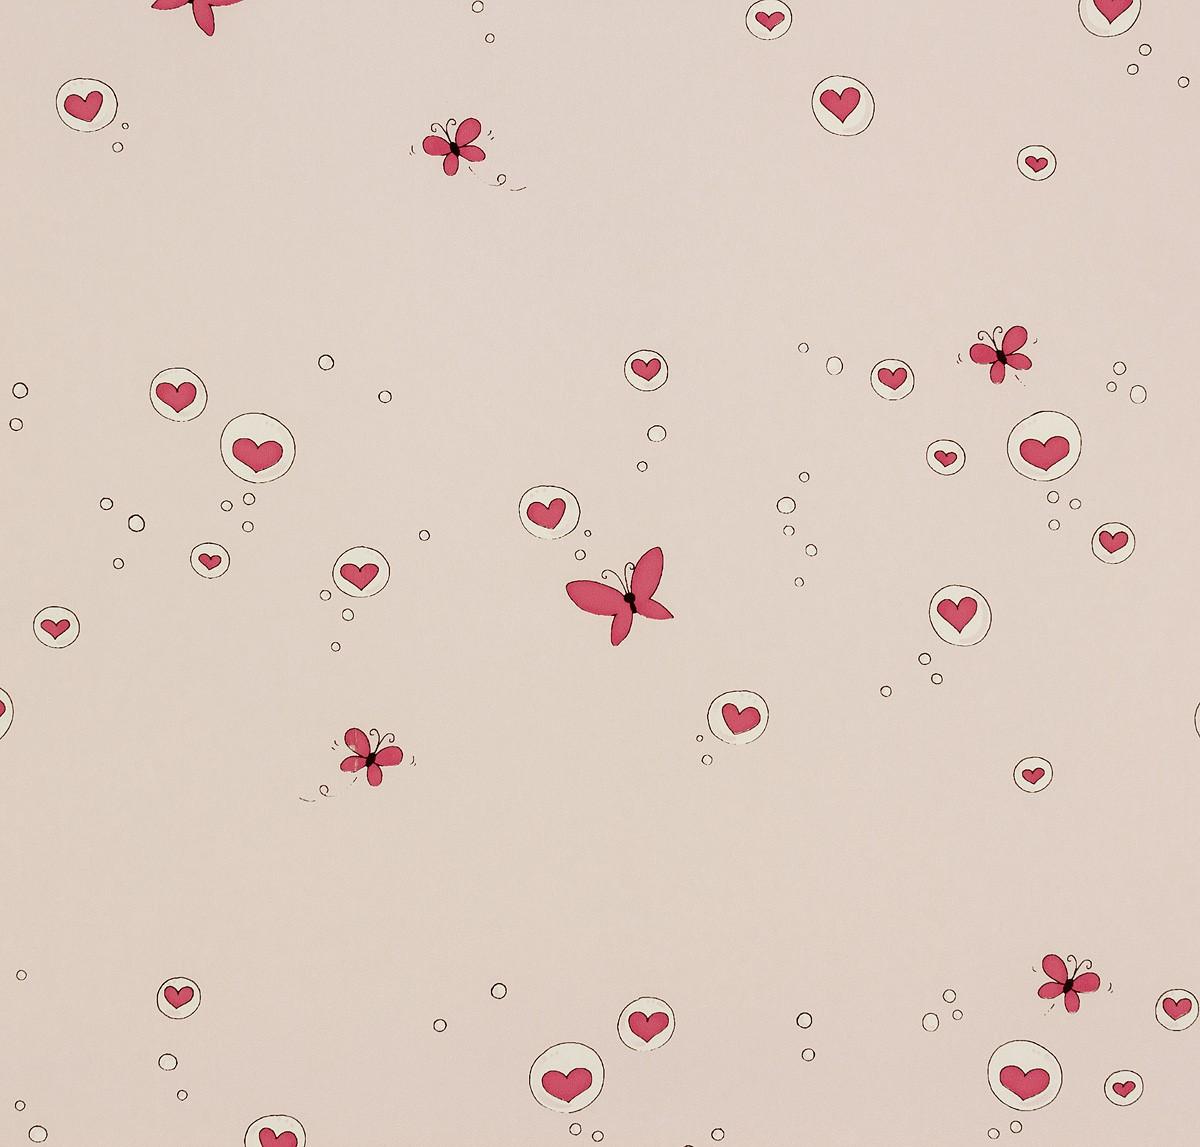 Barbara Becker Tapete Schmetterling : Tapete rosa Kinder Girotondo Rasch Textil 006008